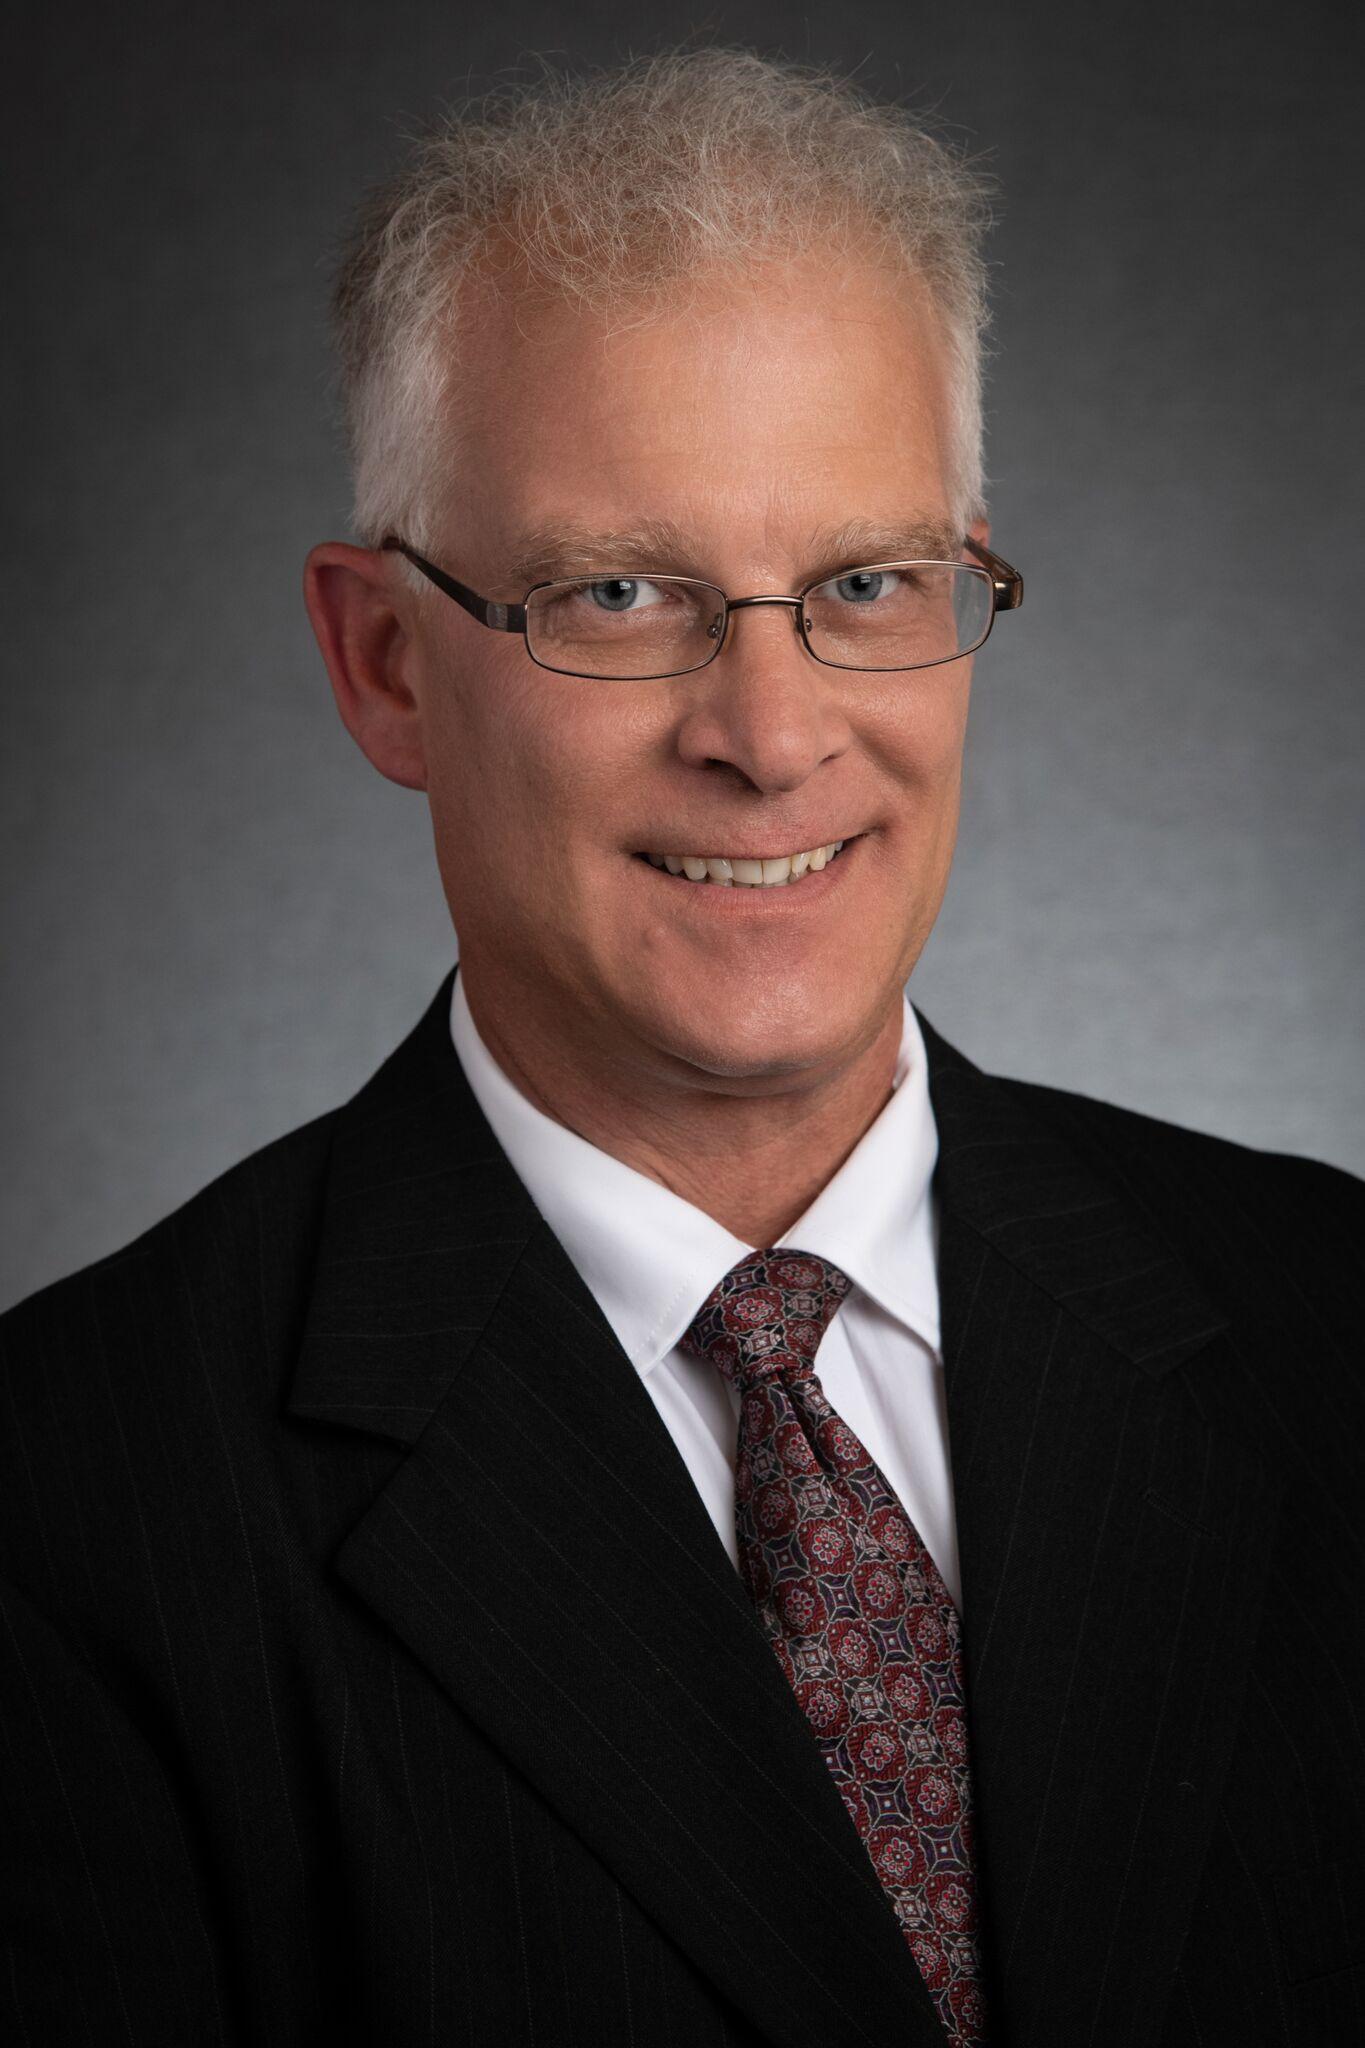 Justin Lateer : Funeral Director